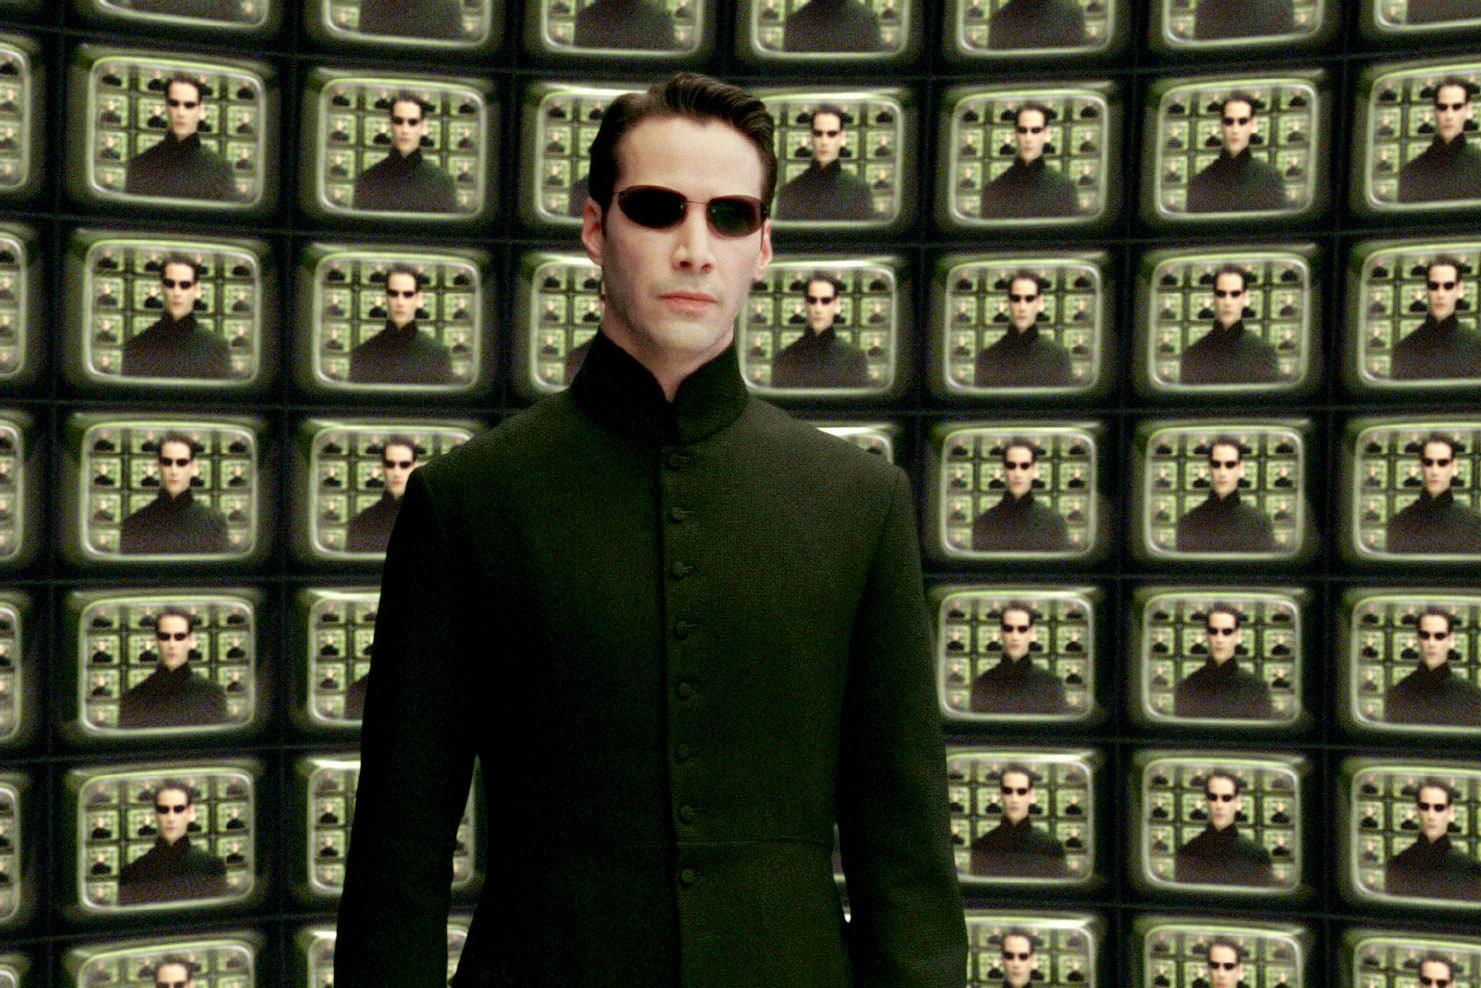 keanu-reeves-matrix-4-2021-movies